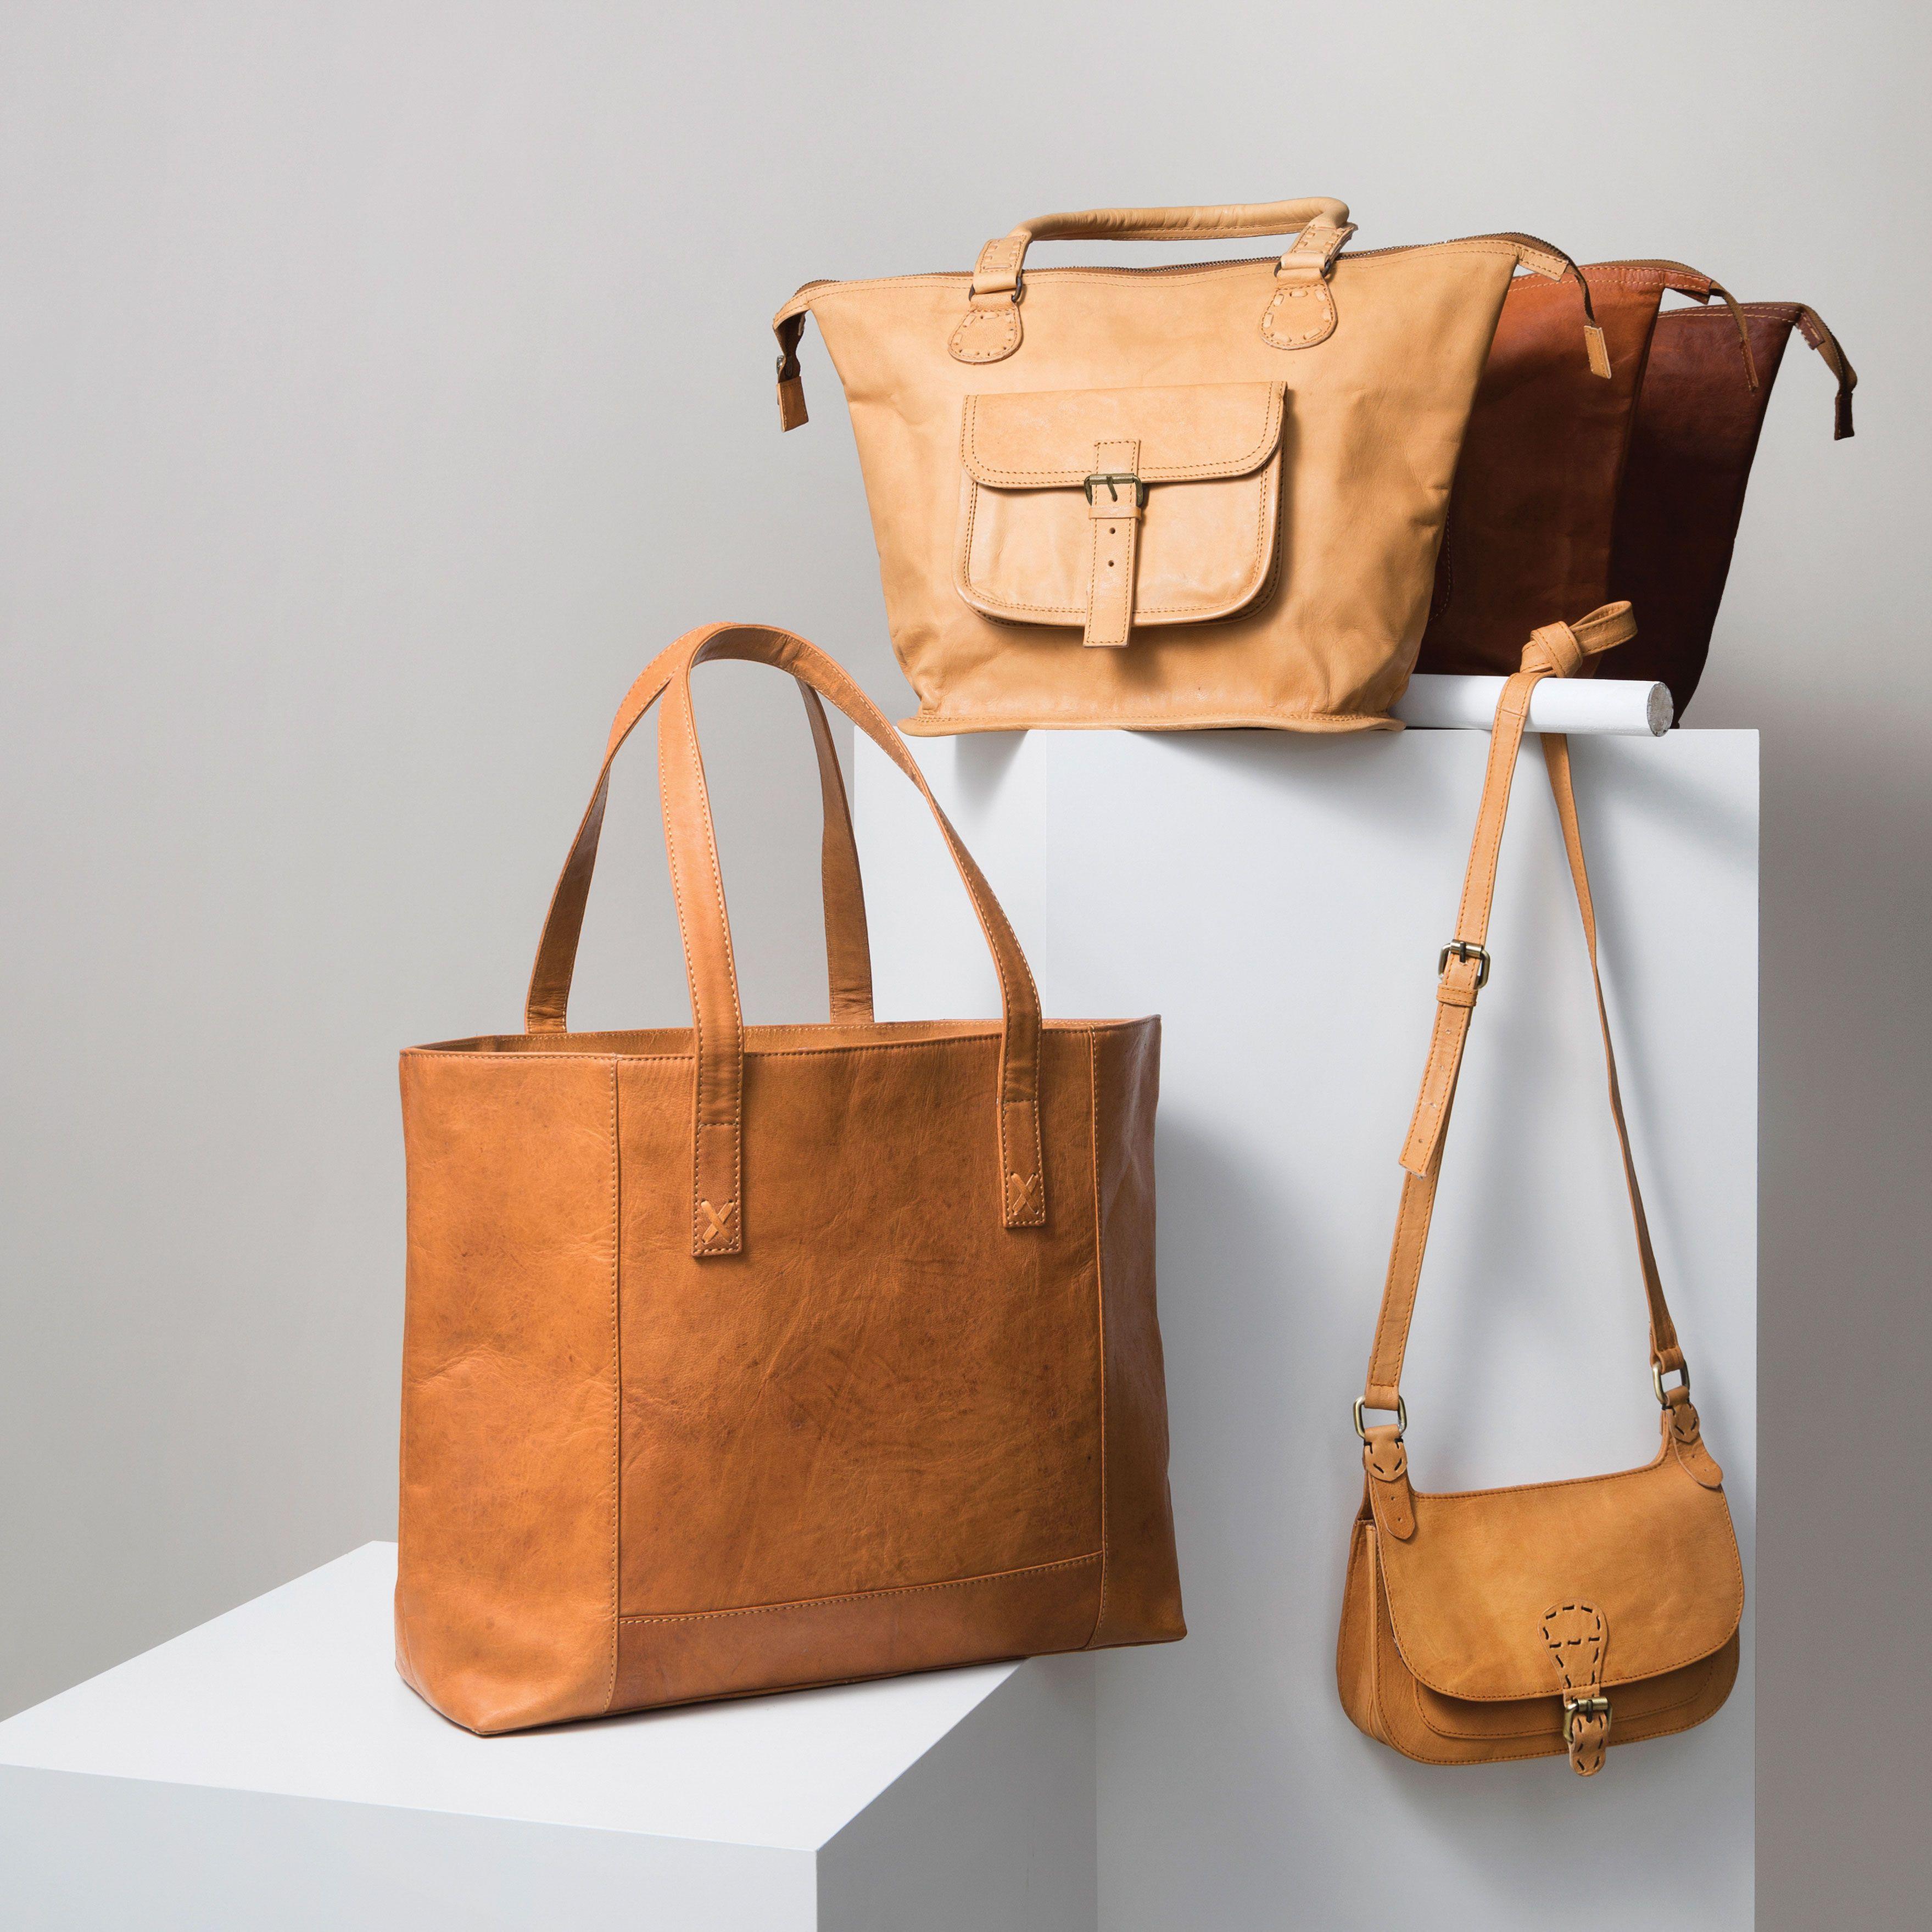 98c08b3115c5 Fair Trade, Accessories, Handbag, India, Modern Leather Tote, Goat ...